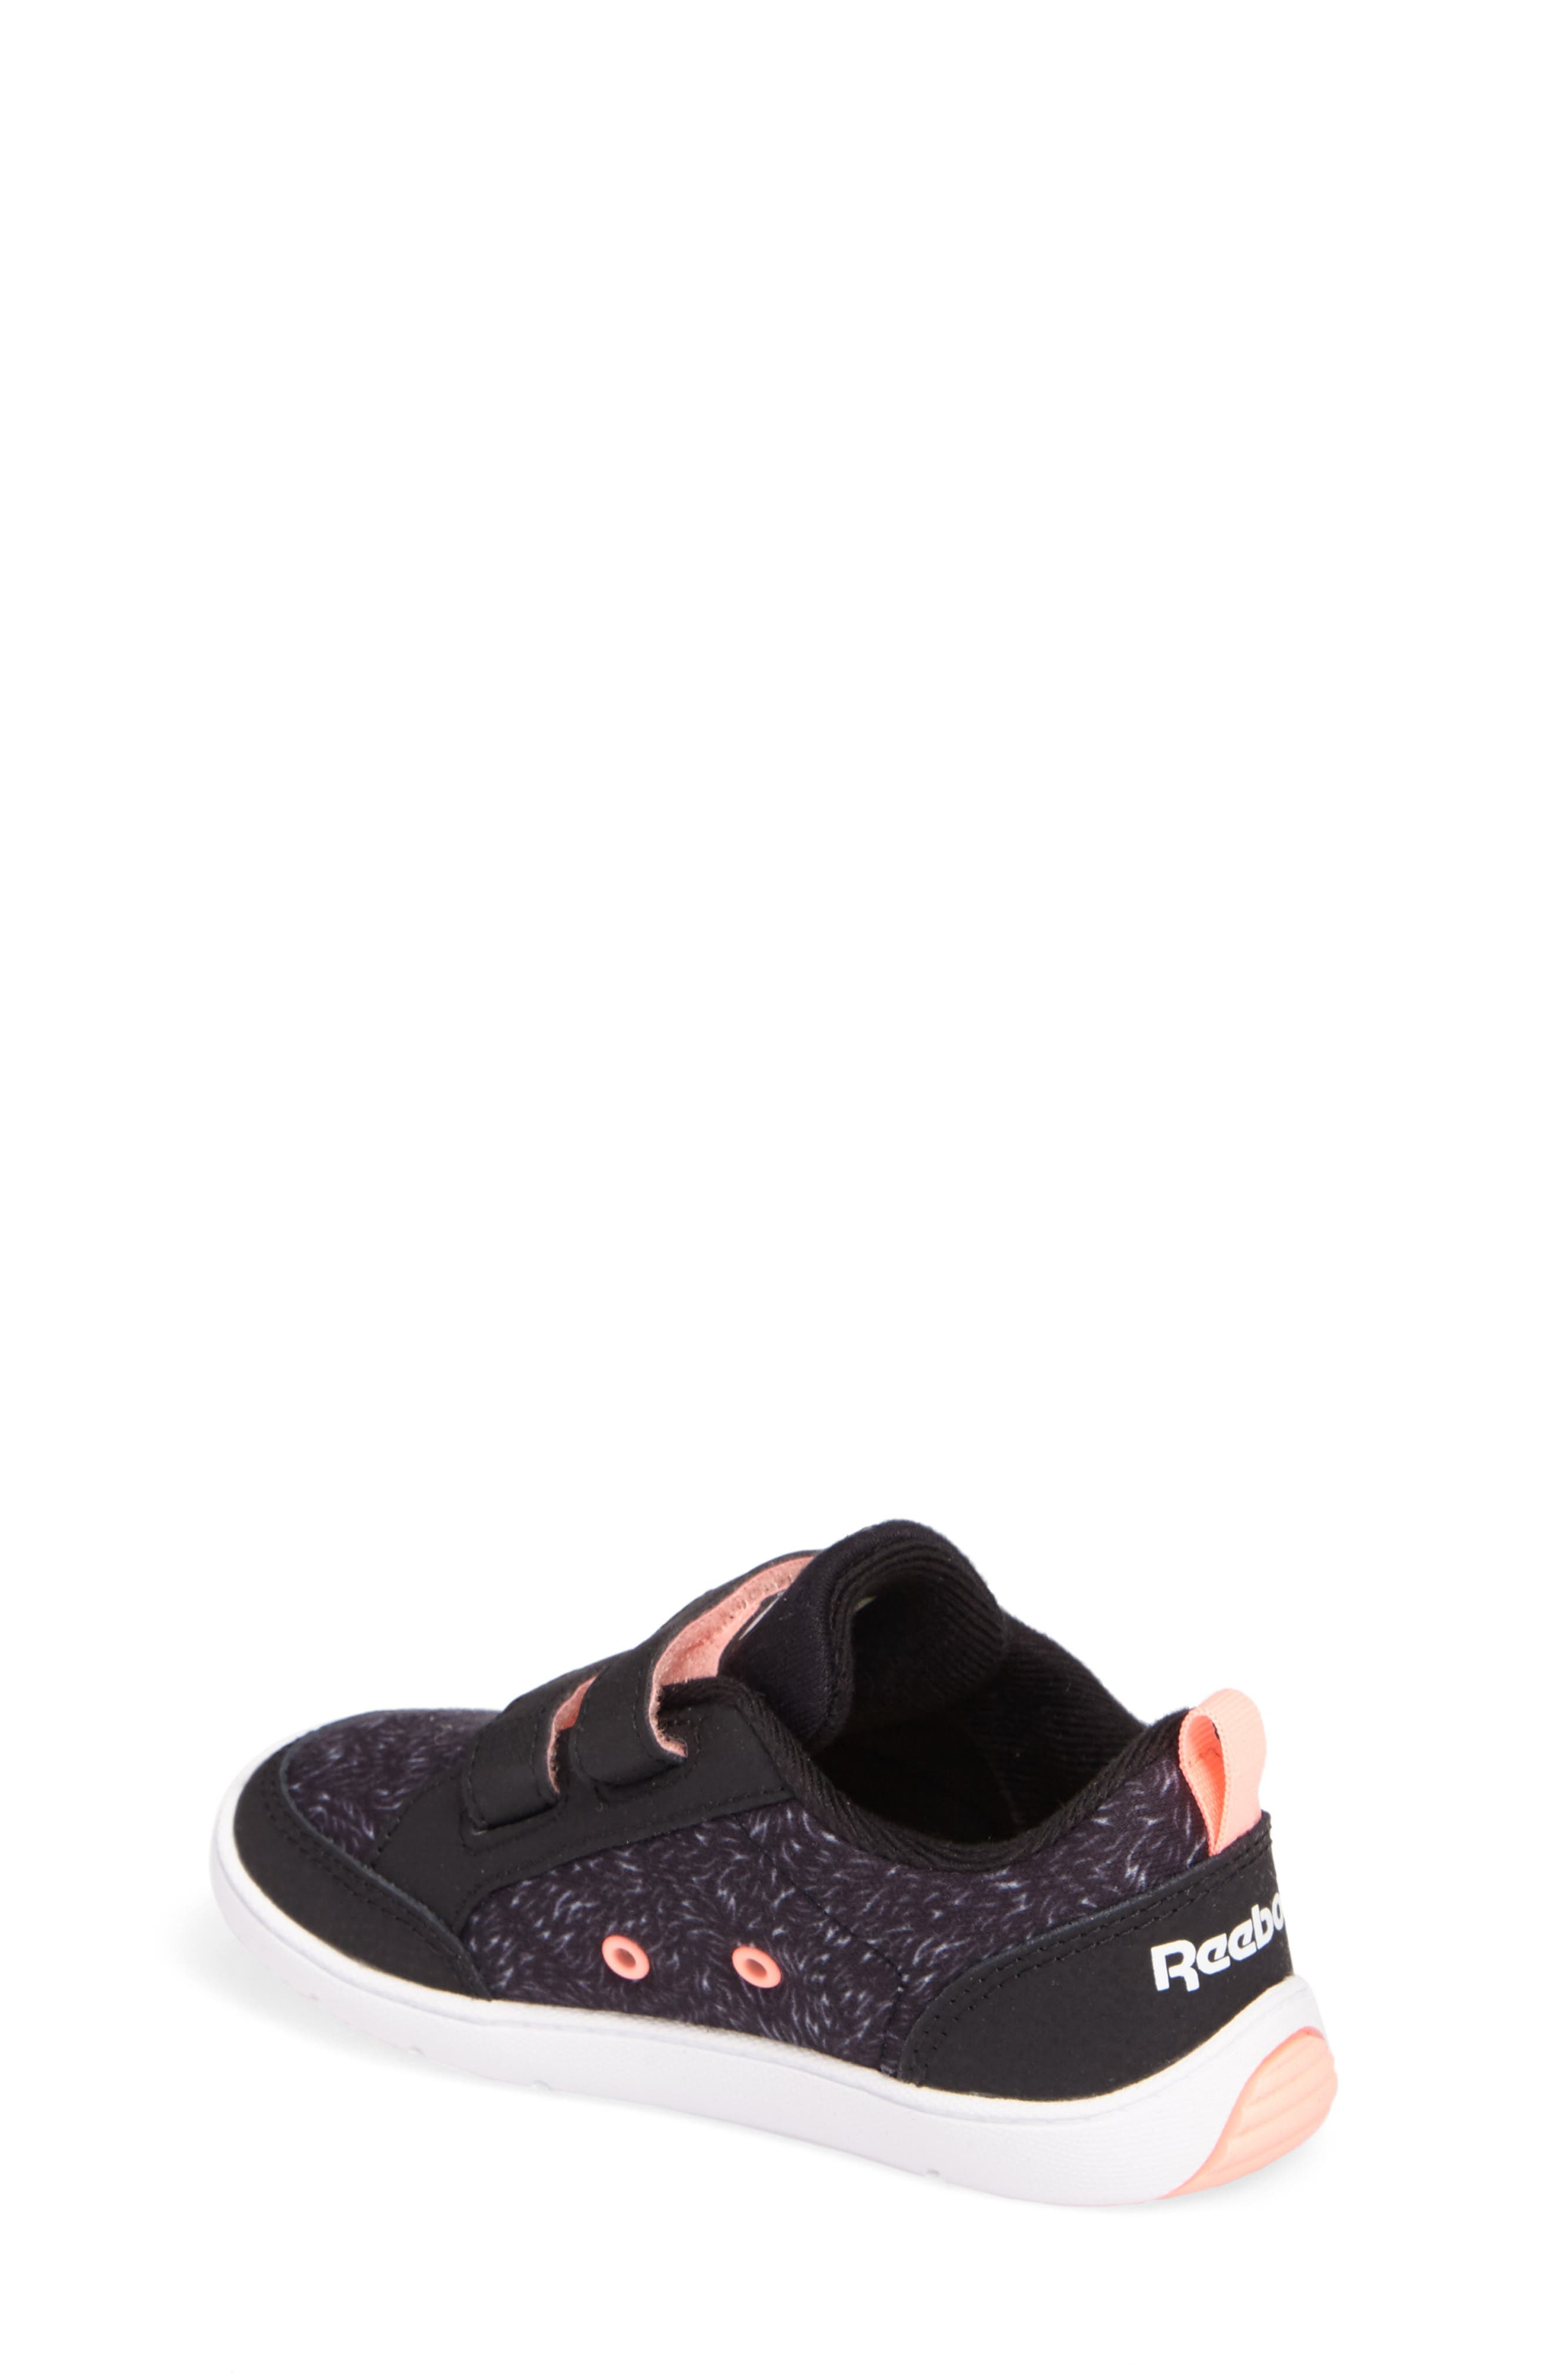 Ventureflex Critter Feet Sneaker,                             Alternate thumbnail 2, color,                             Artic Black/ White/ Sour Melon